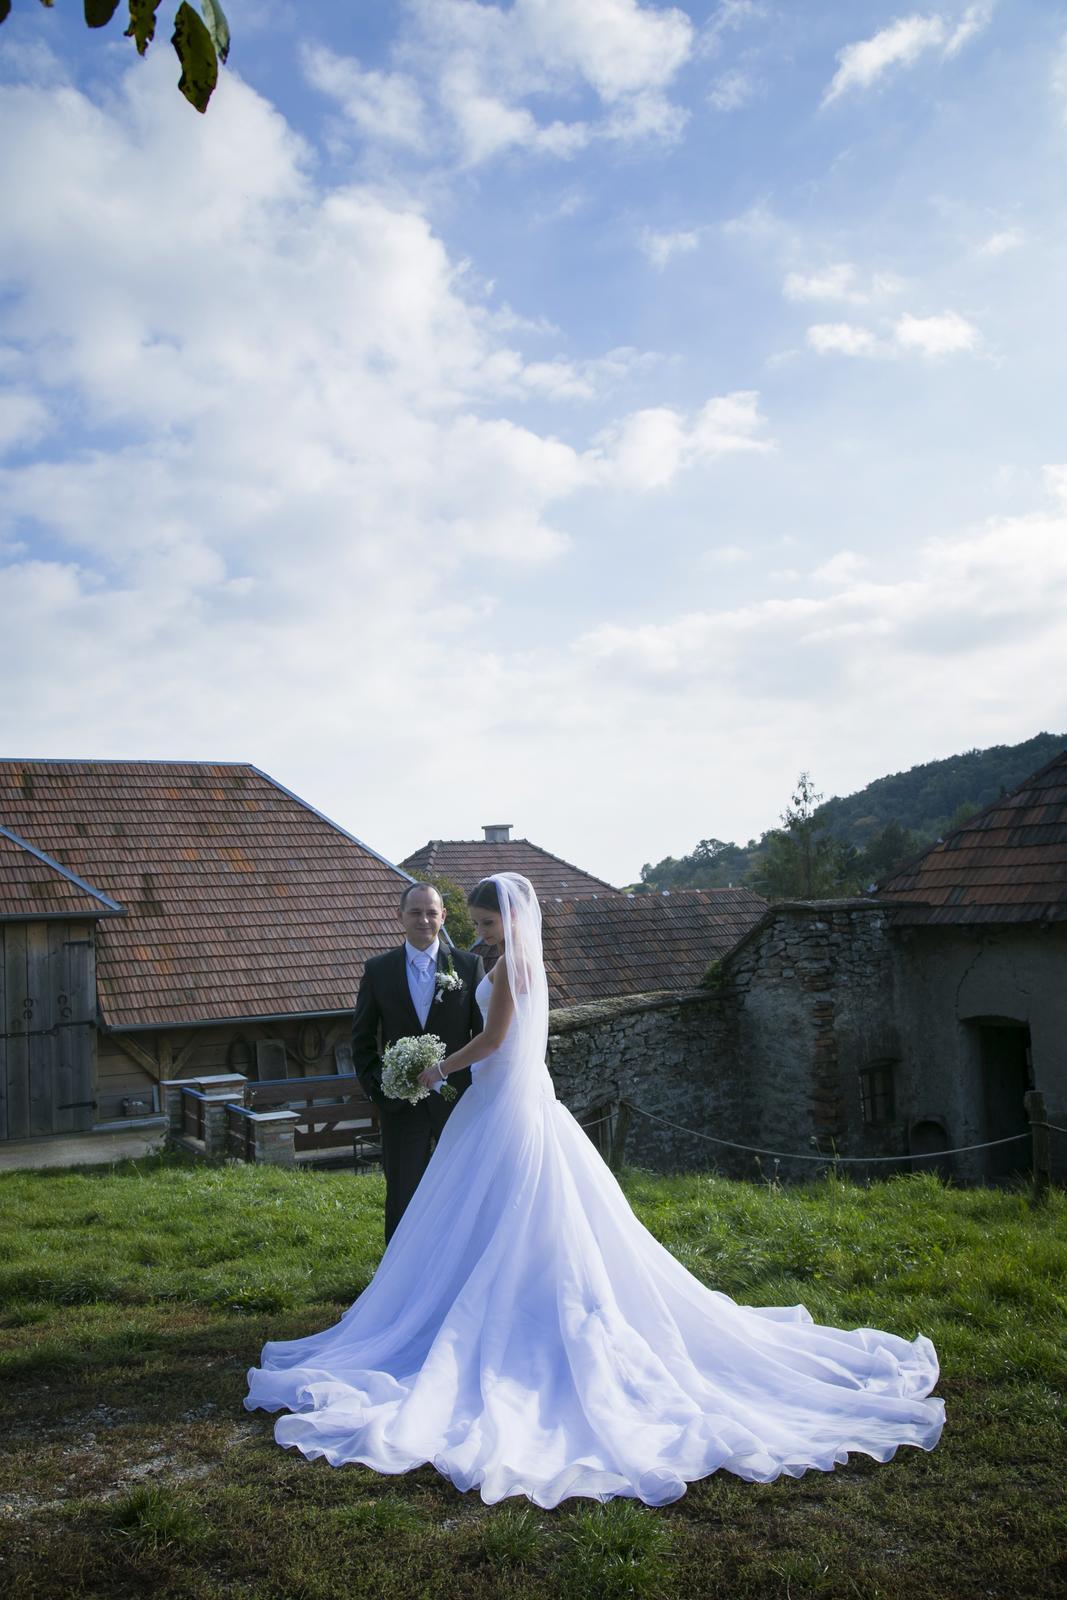 Svadobné šaty La Sposa 36 - Obrázok č. 3